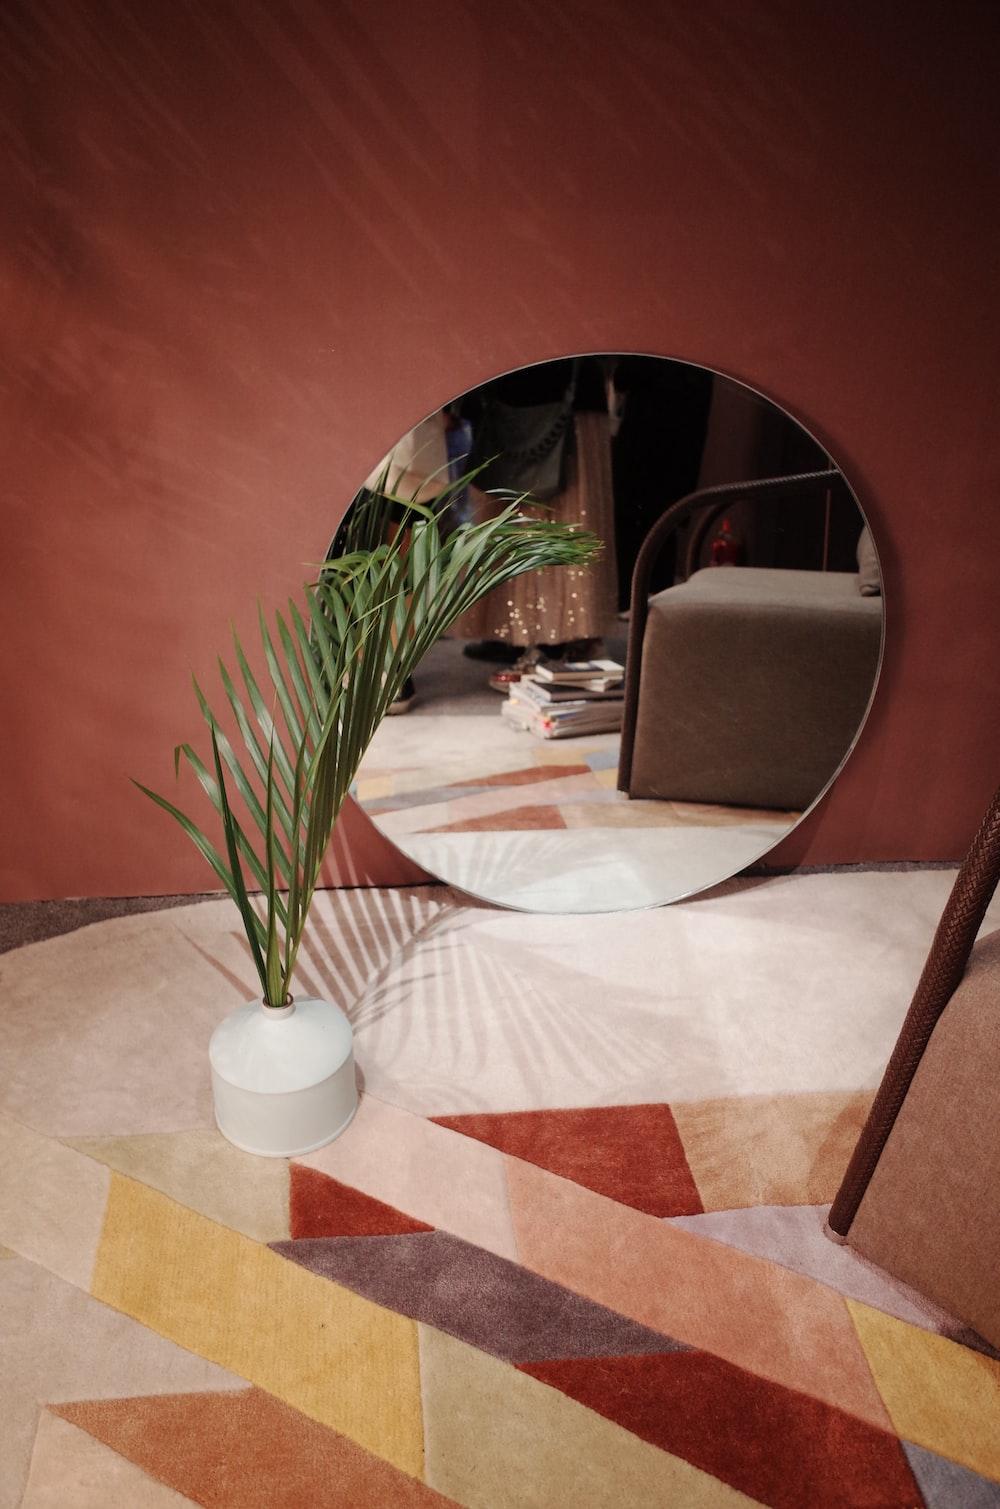 round mirror behind potted flower on floor inside room